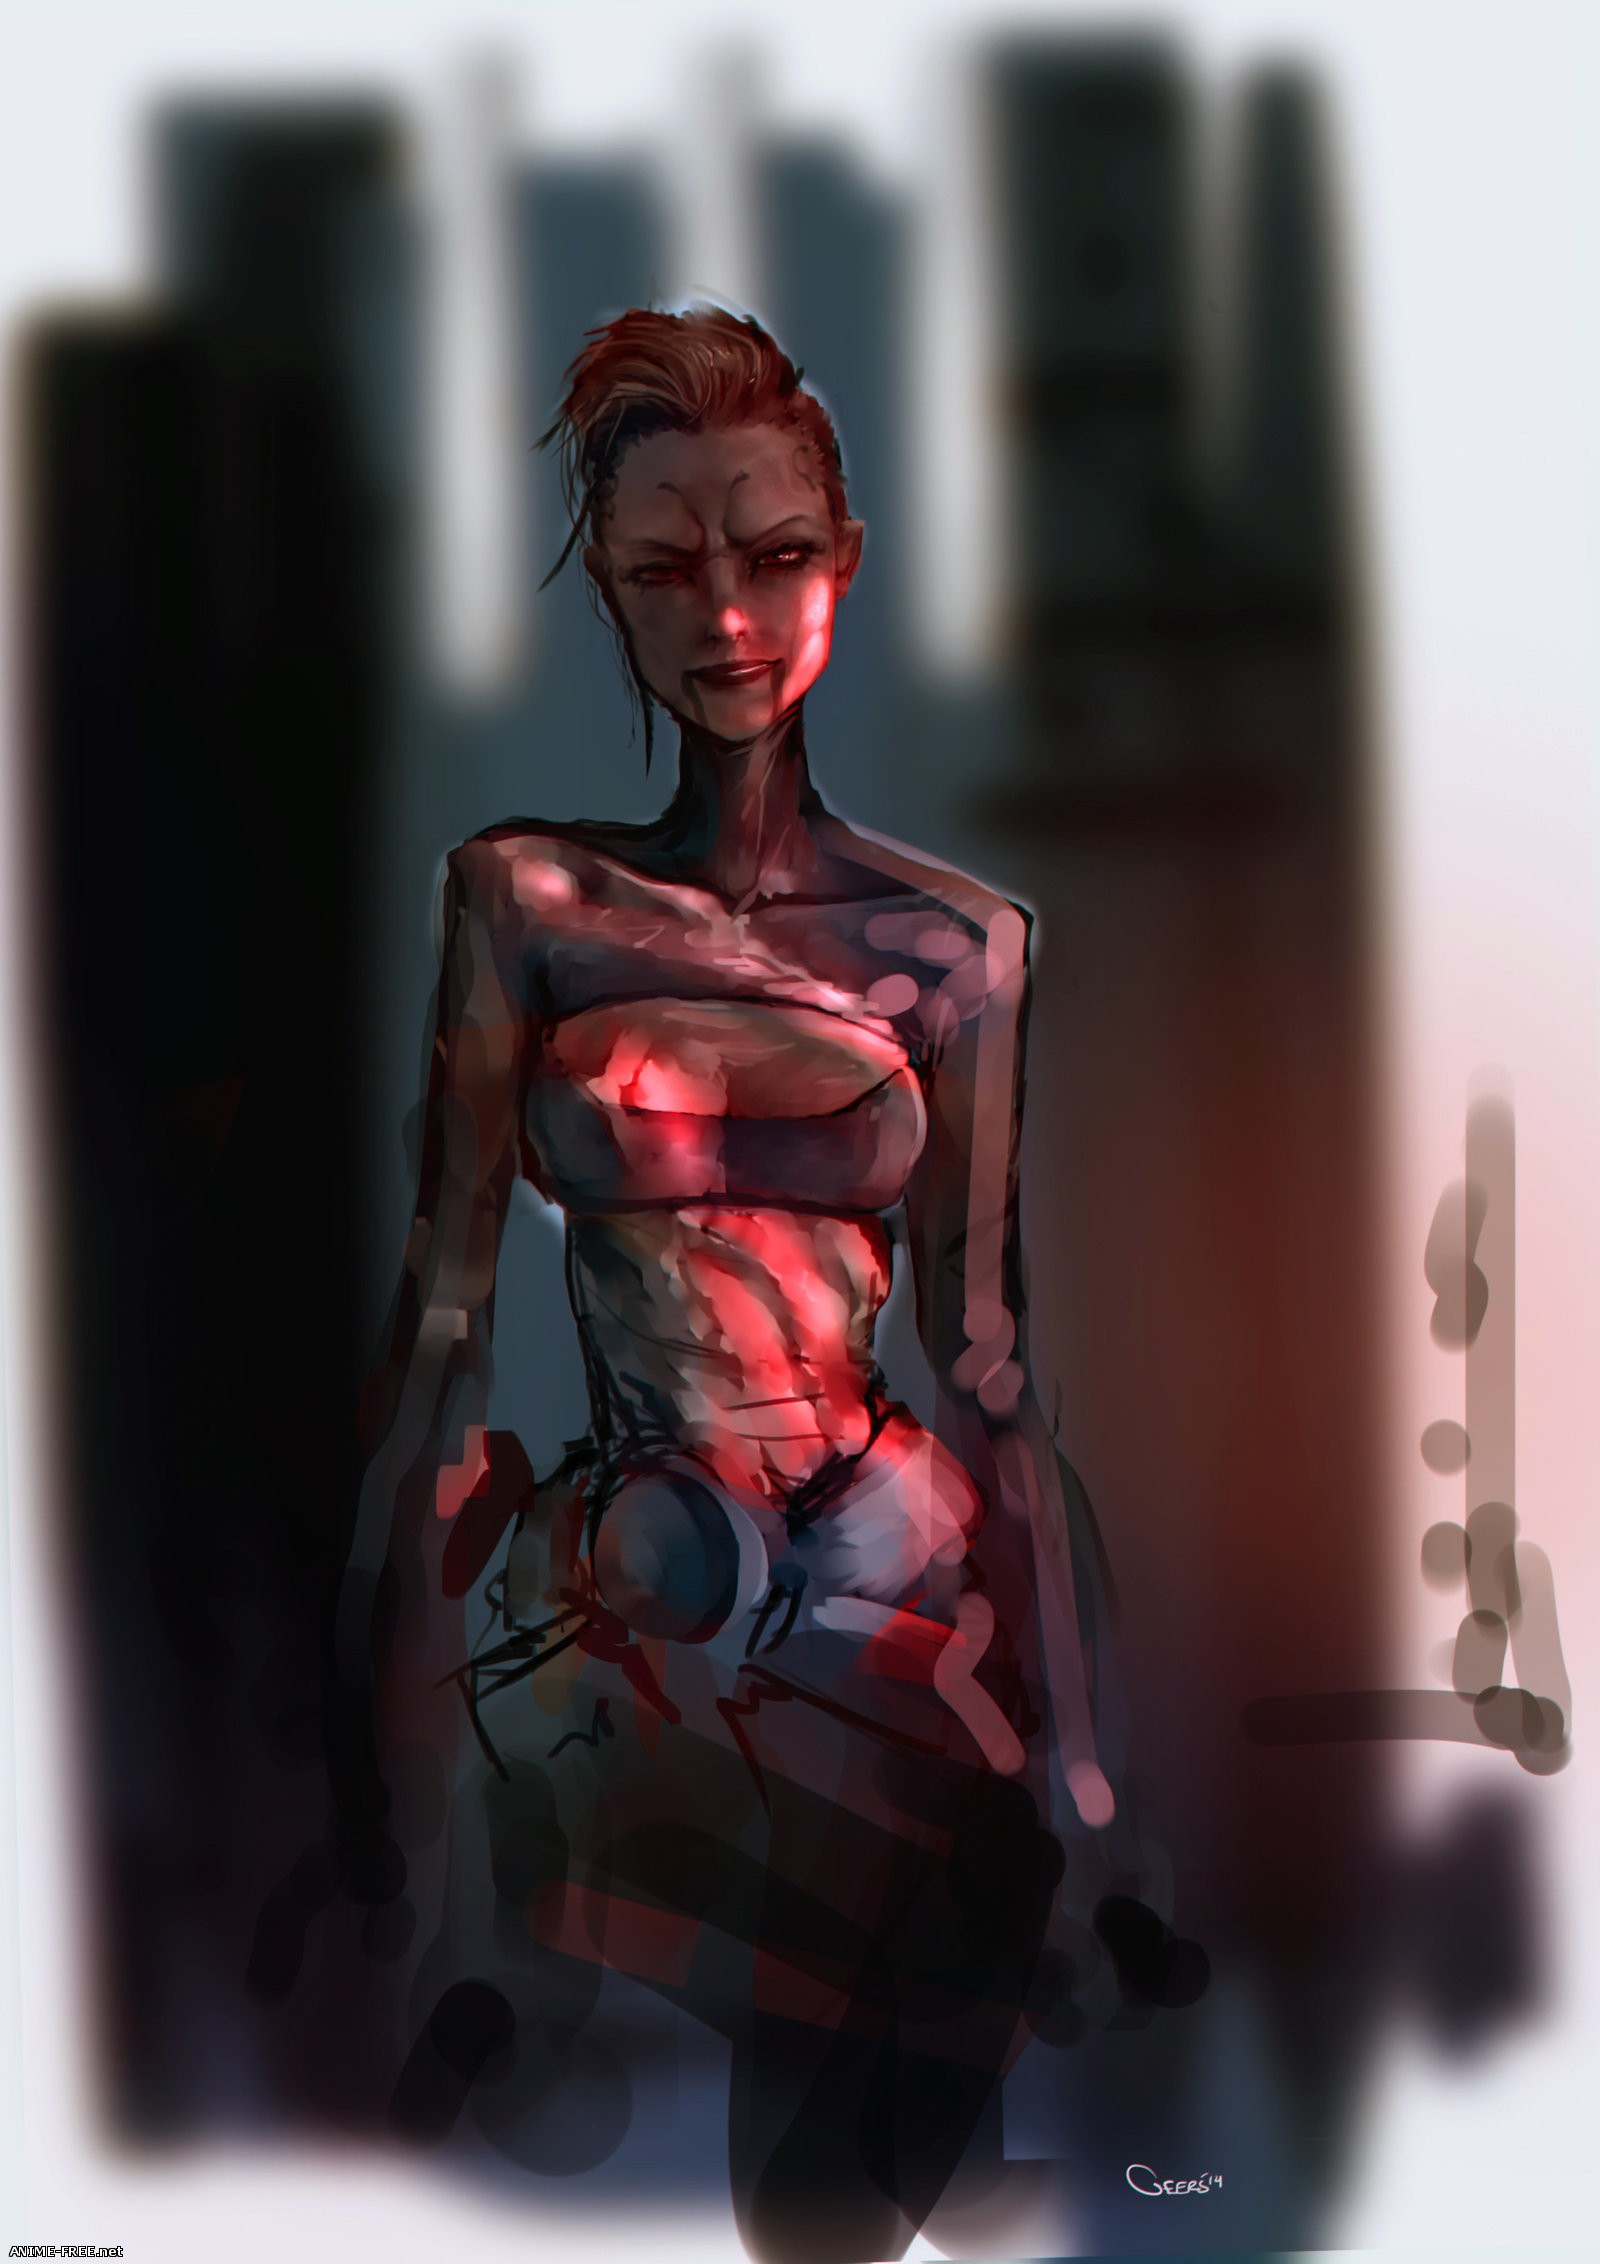 Star Wars porno Pics [Uncen] [JPG,BMP,GIF] Hentai ART